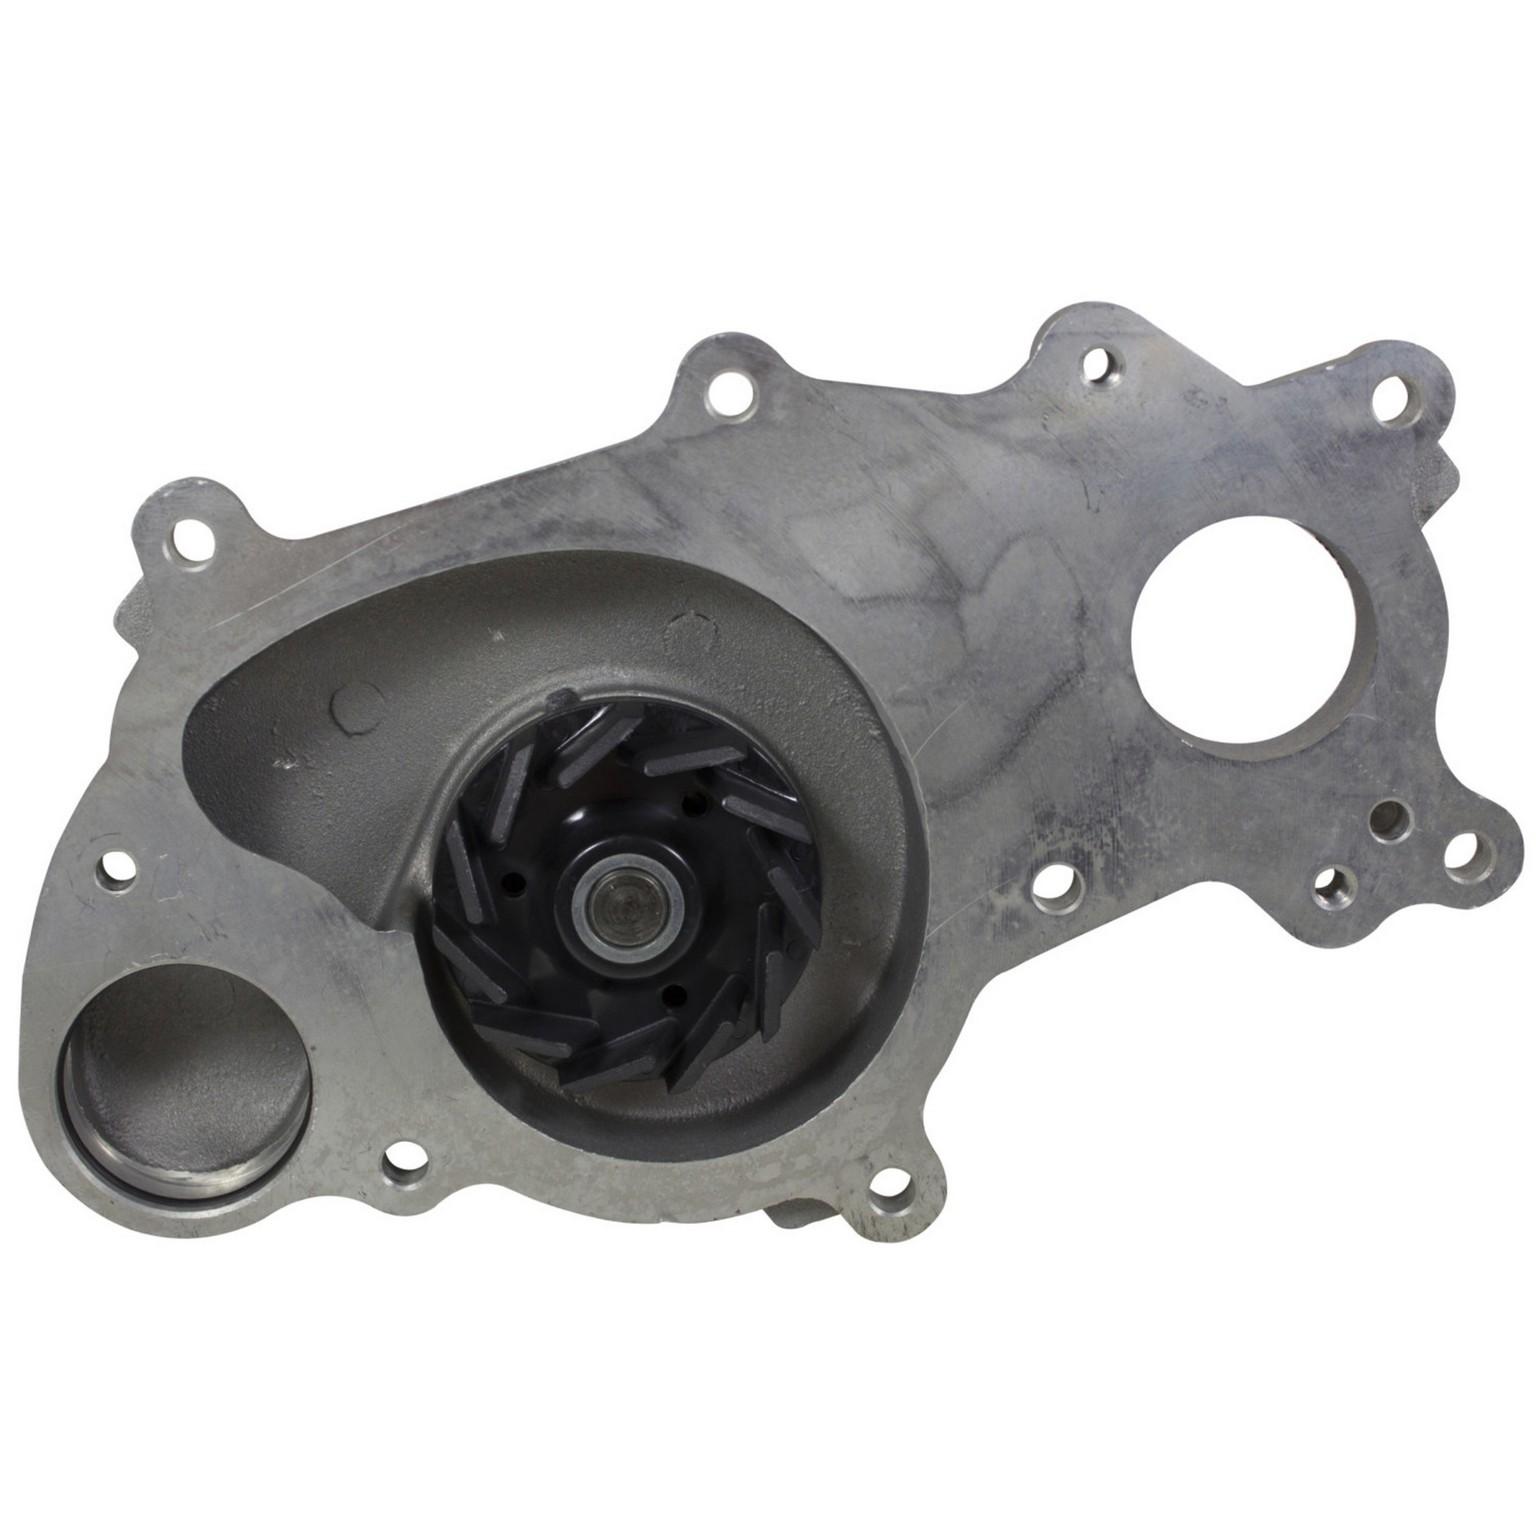 Toyota 31301-21060 Clutch Pedal